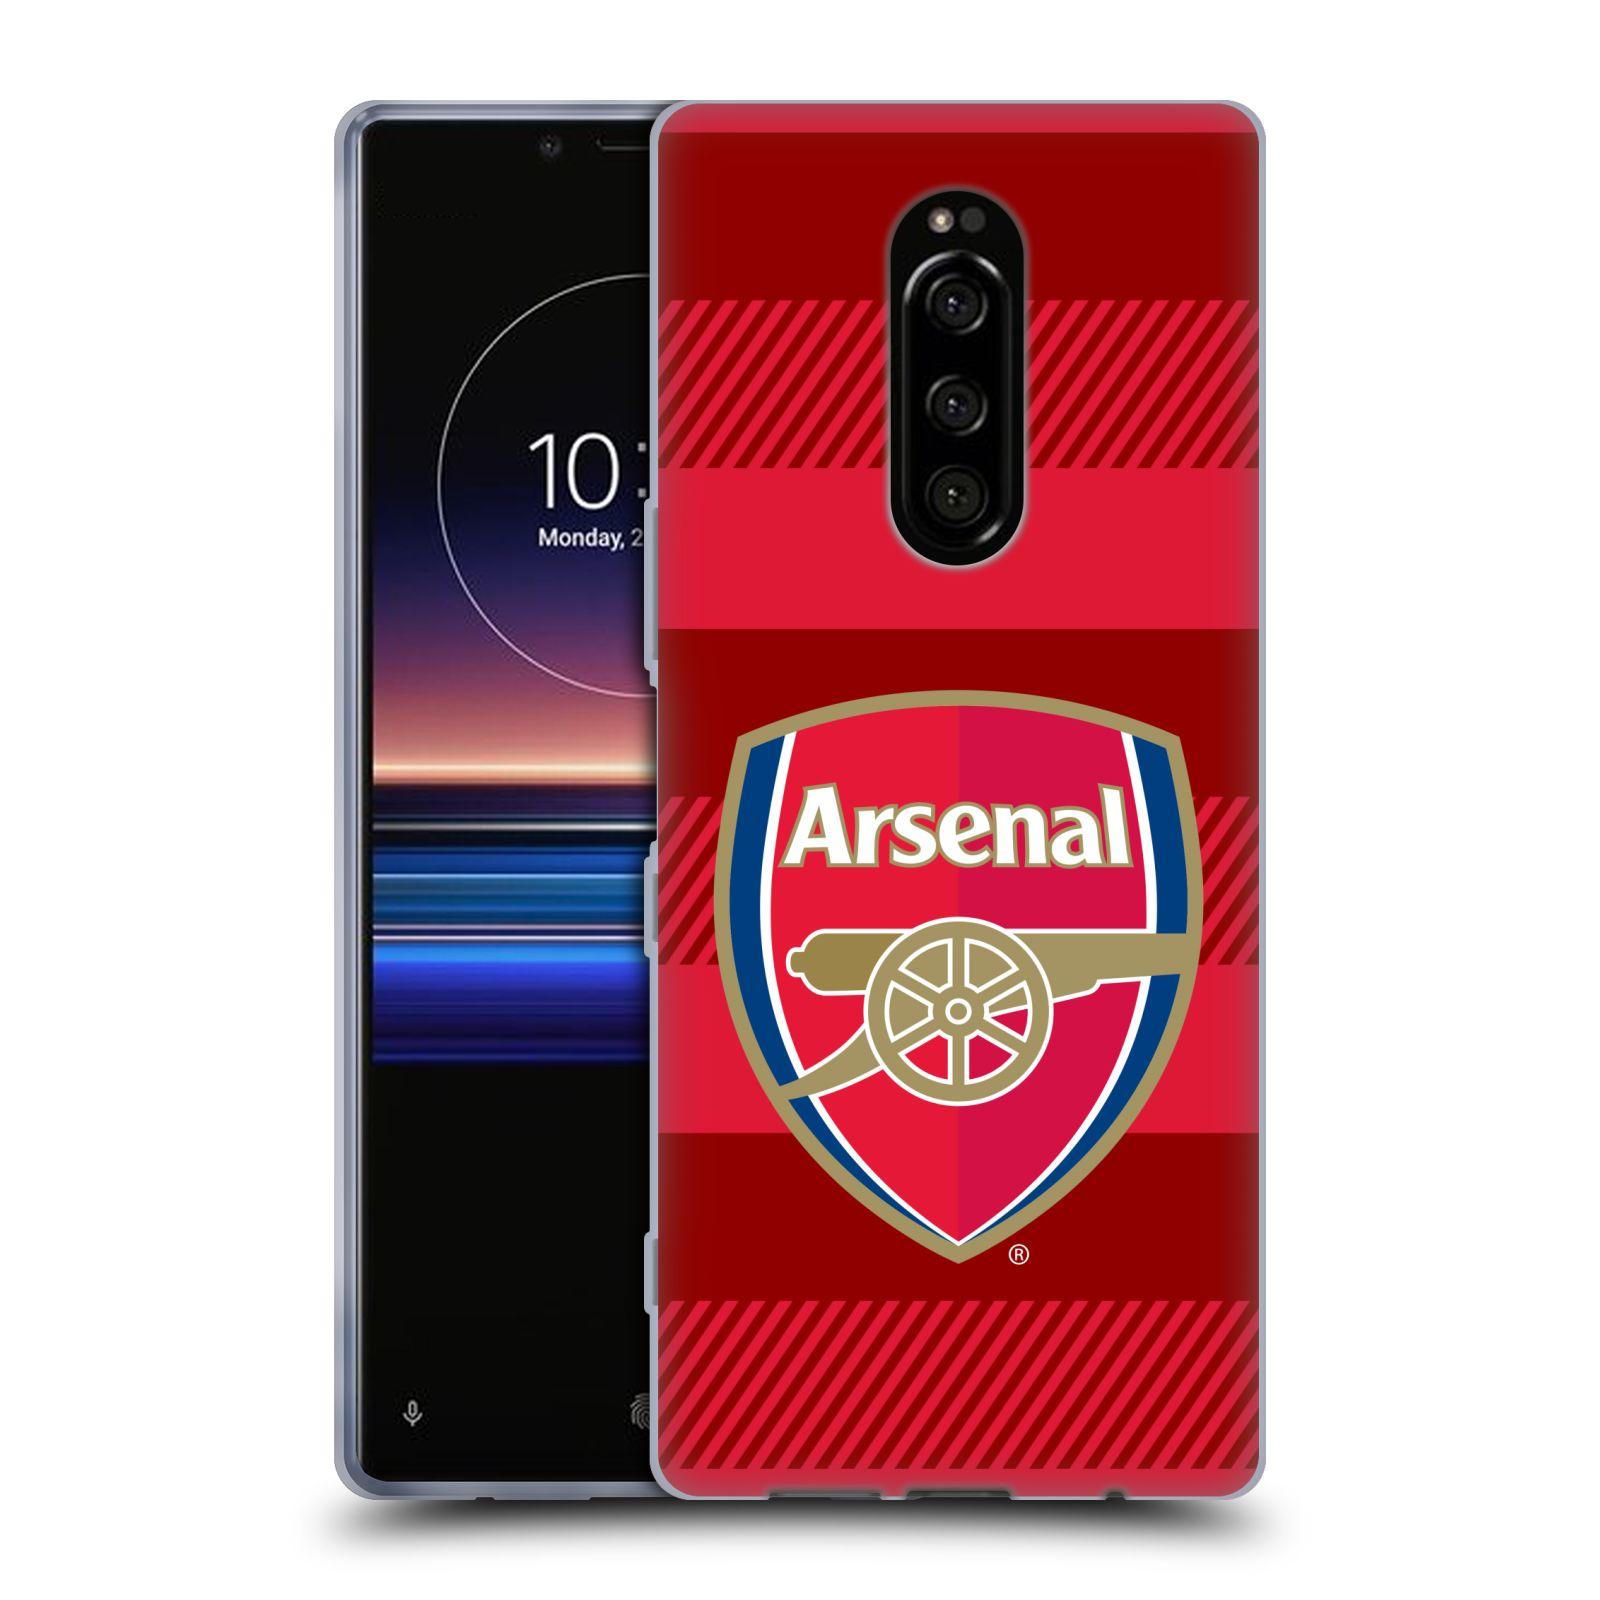 Silikonové pouzdro na mobil Sony Xperia 1 - Head Case - Arsenal FC - Logo s pruhy